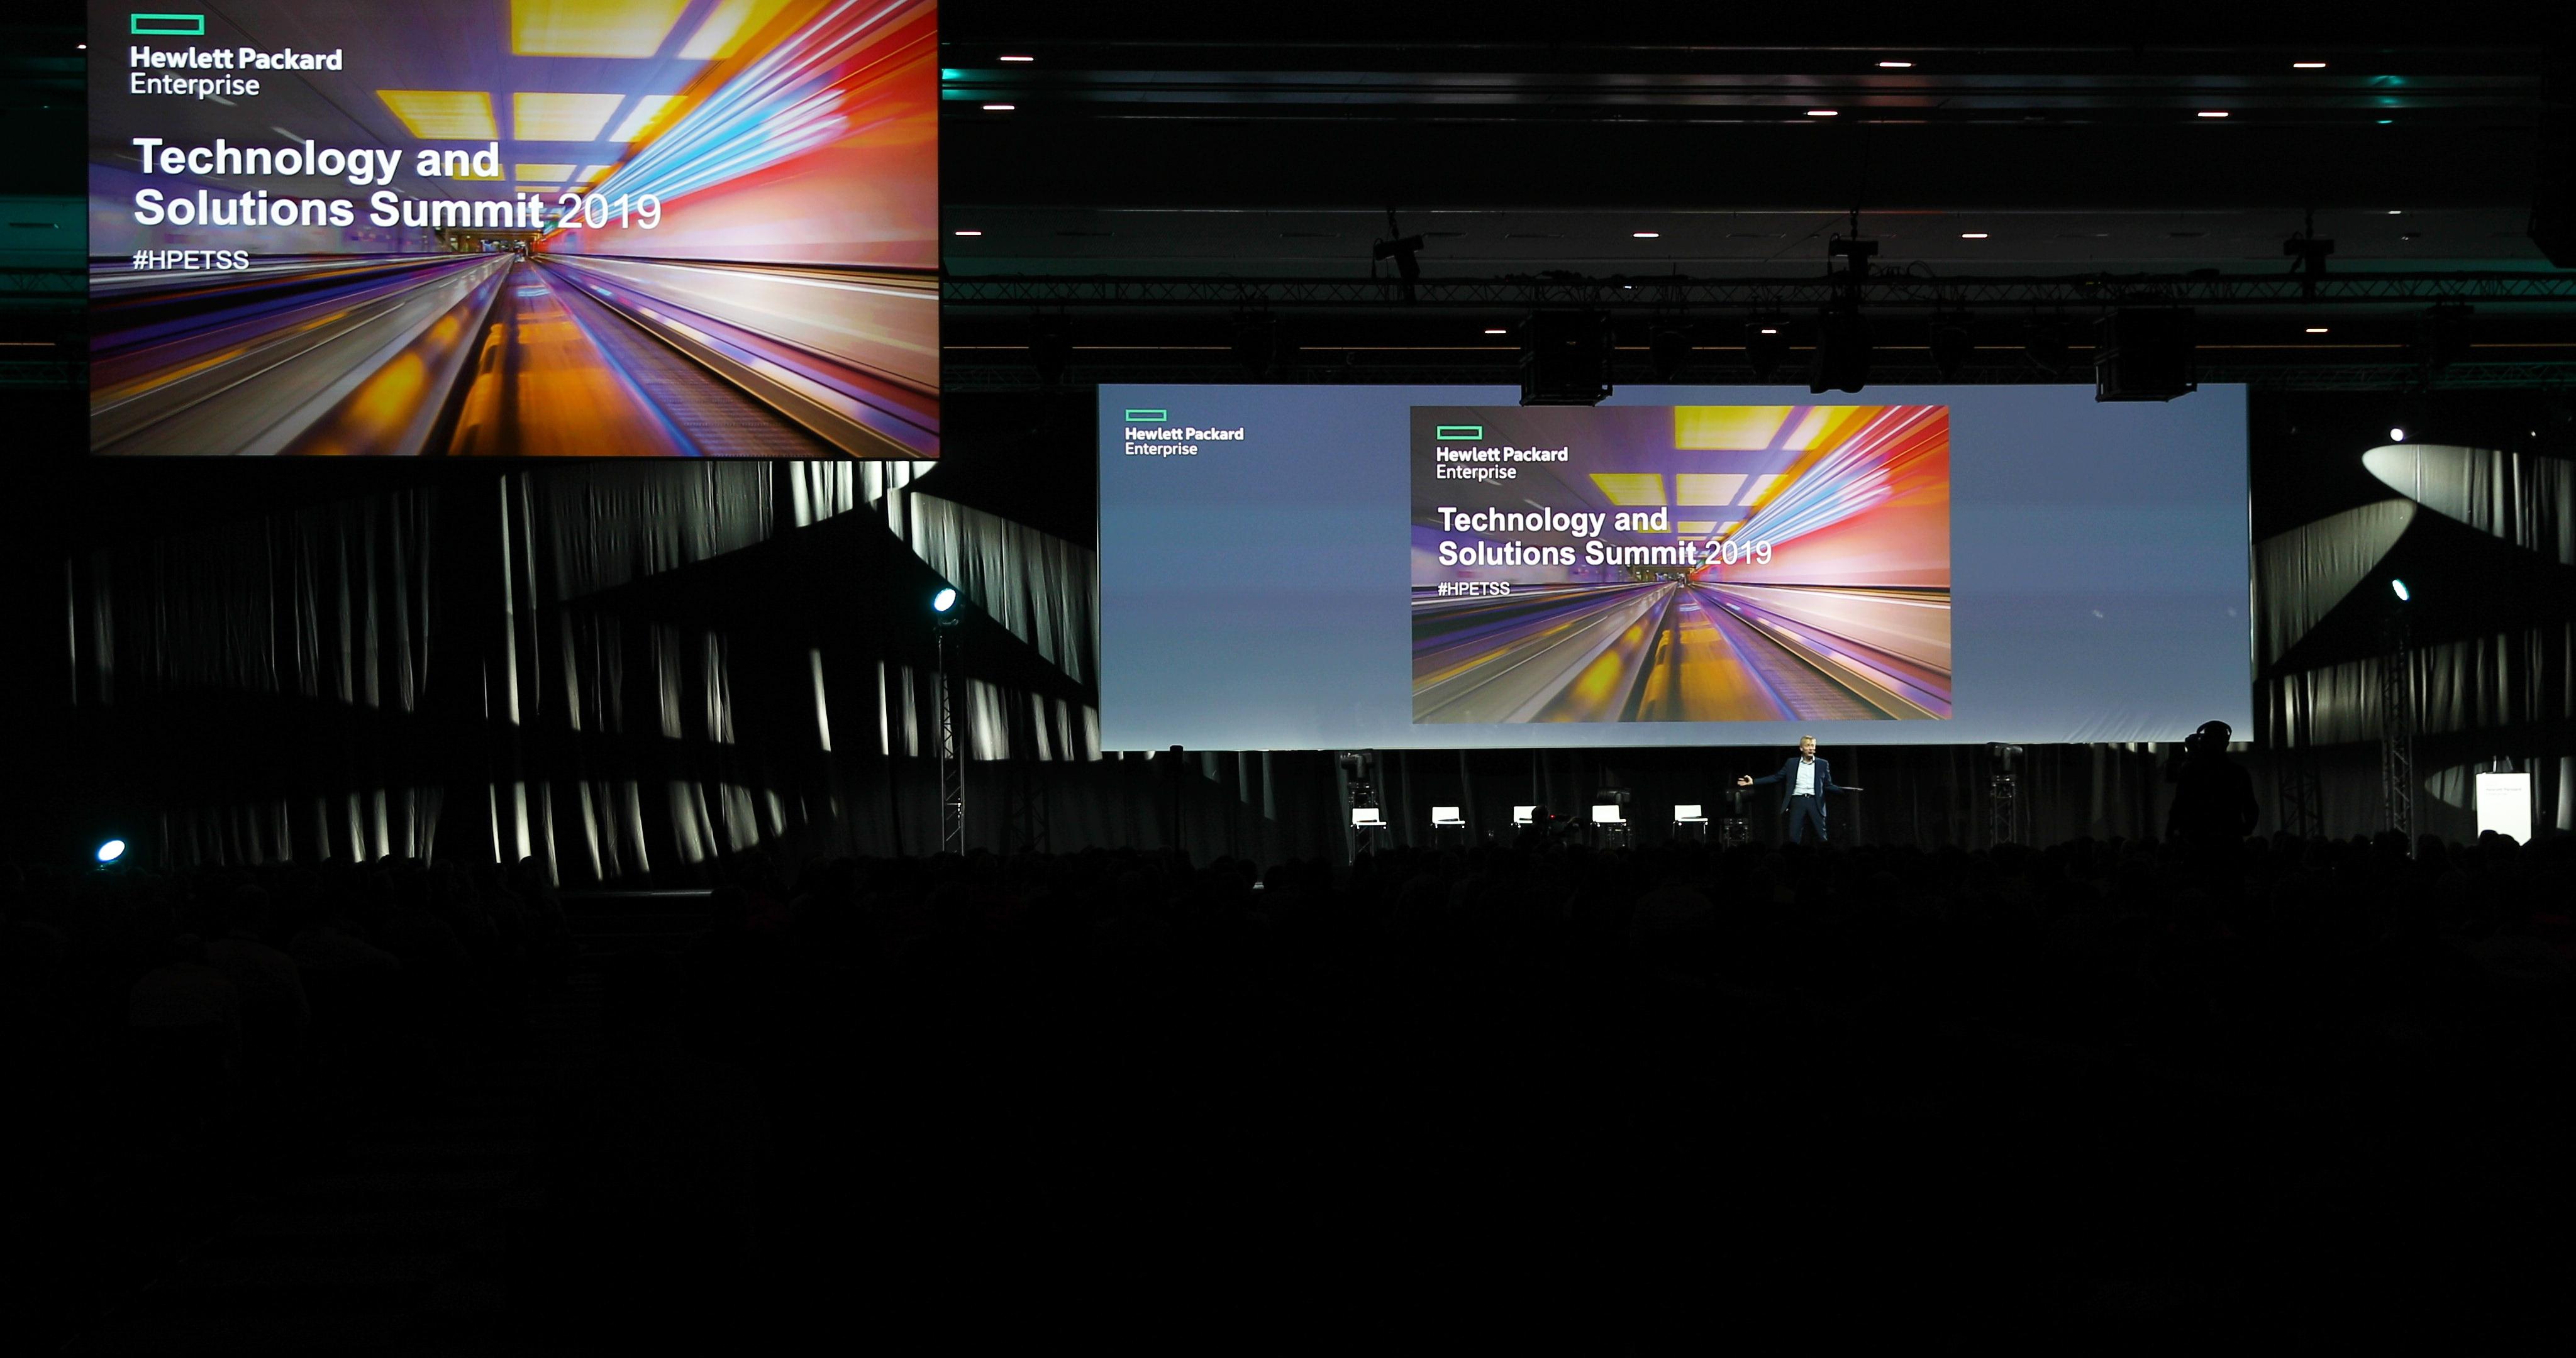 Hewlett Packard Enterprise Technology & Solution Summit 2019